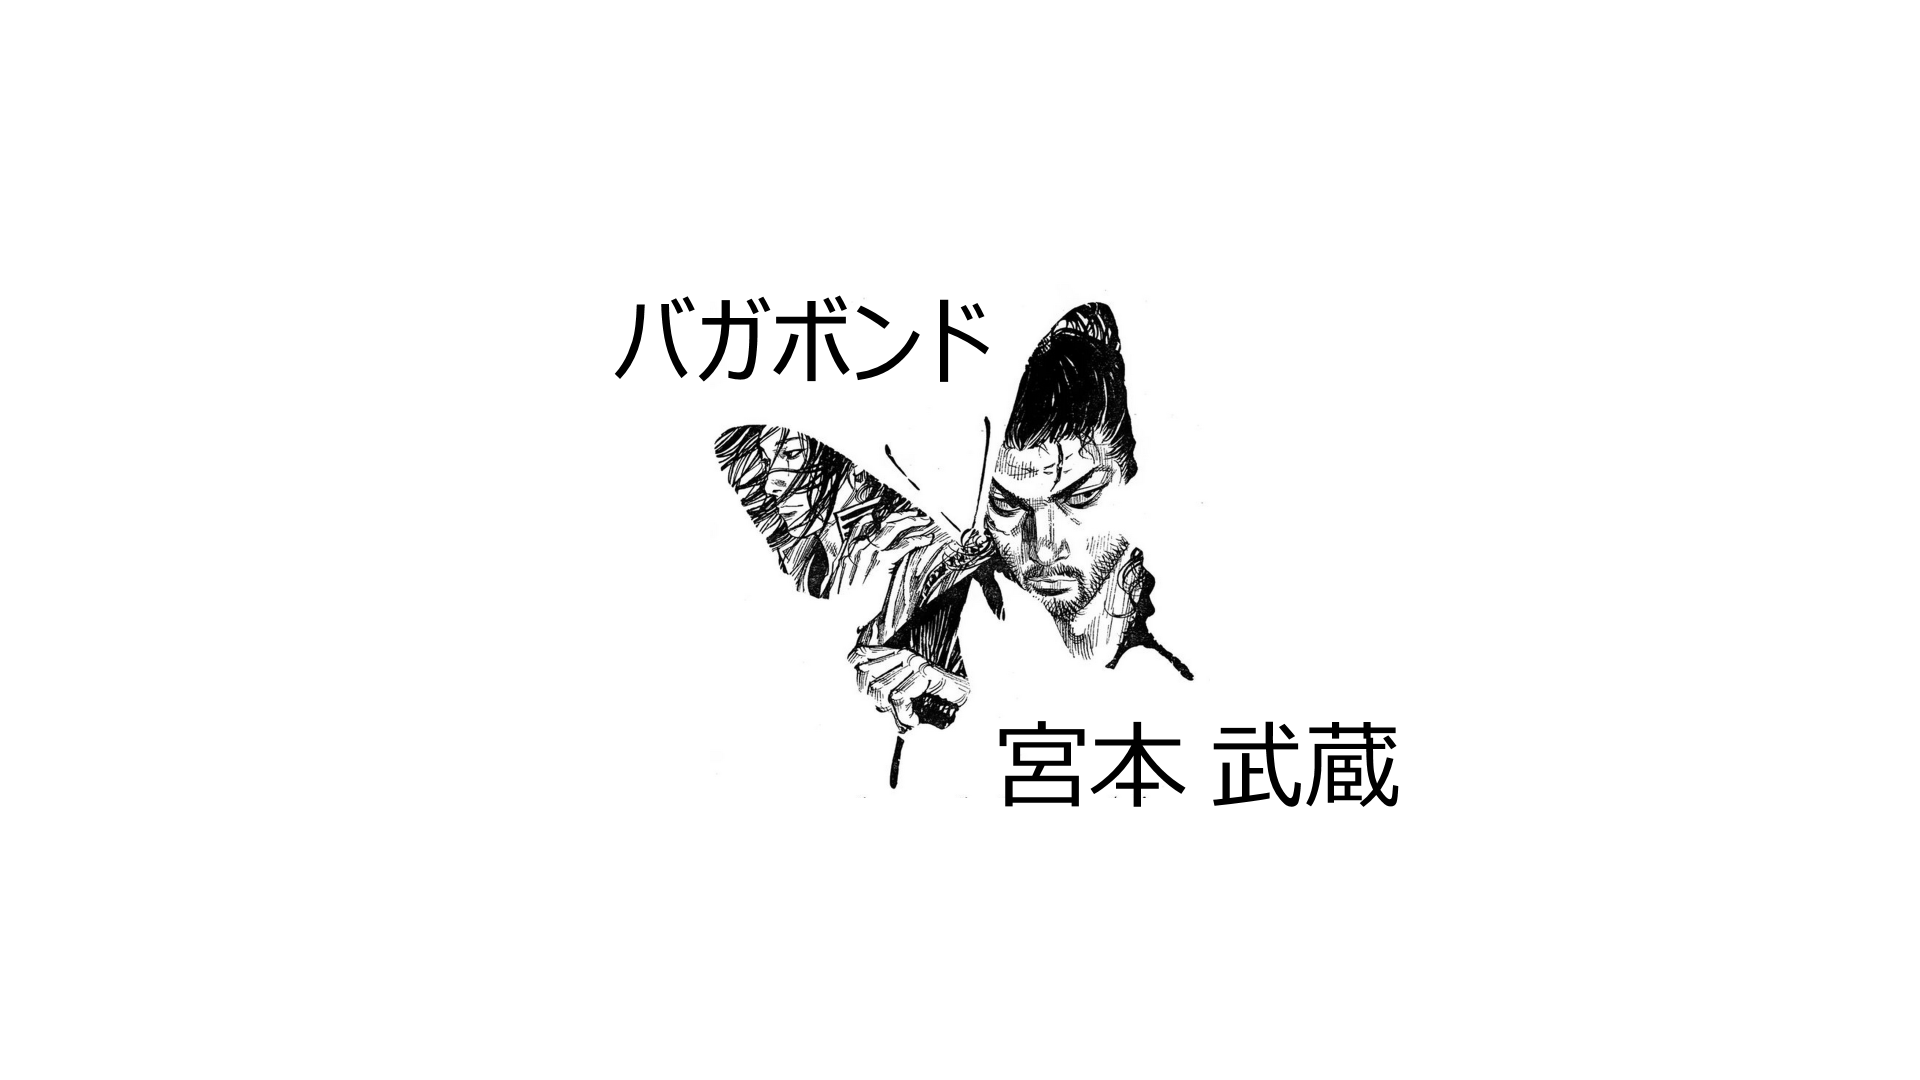 Vagabond With Kanji By Dandycide On Deviantart